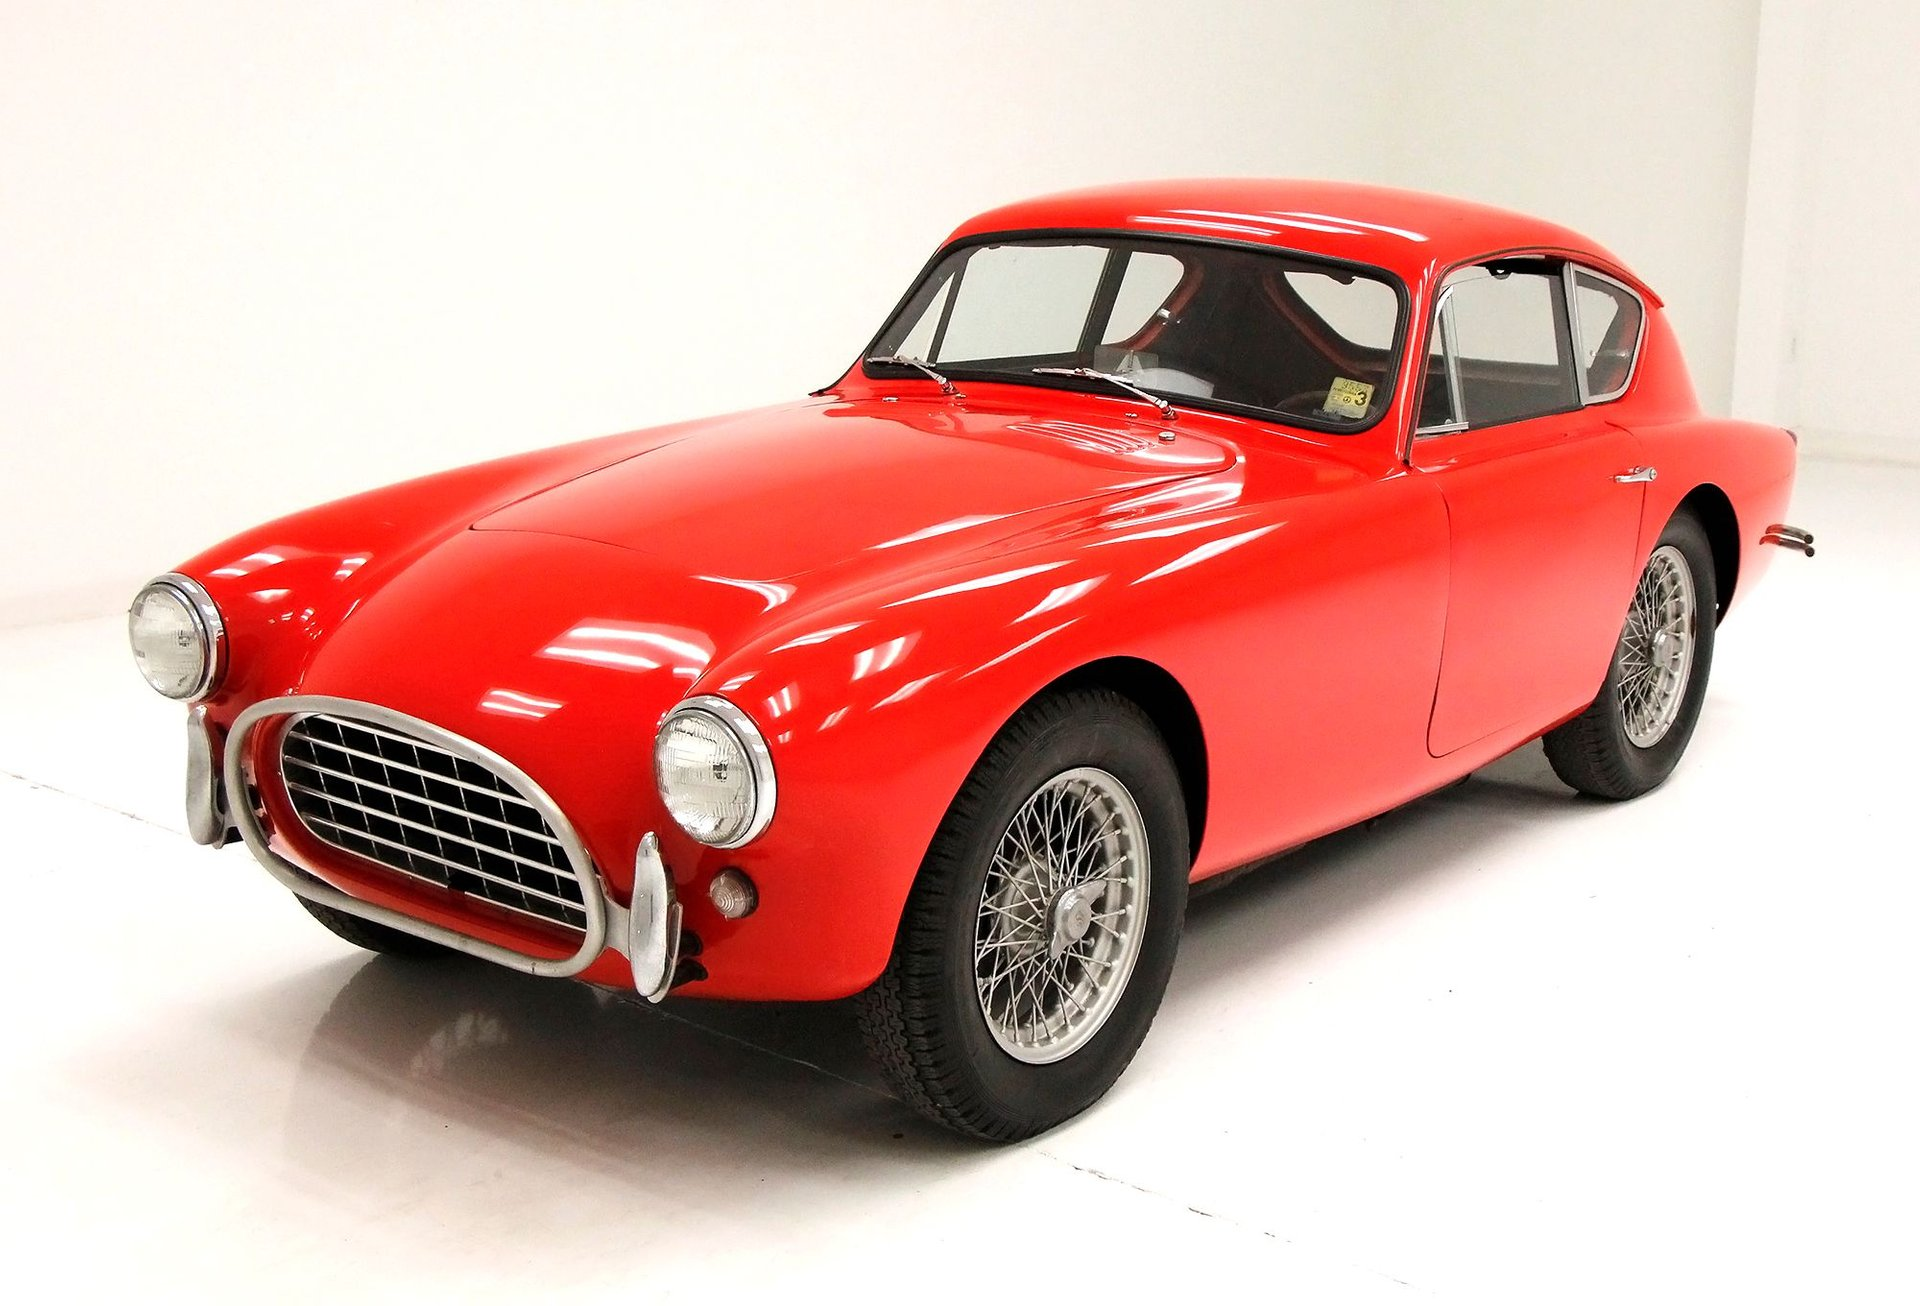 1958 AC Aceca Coupe